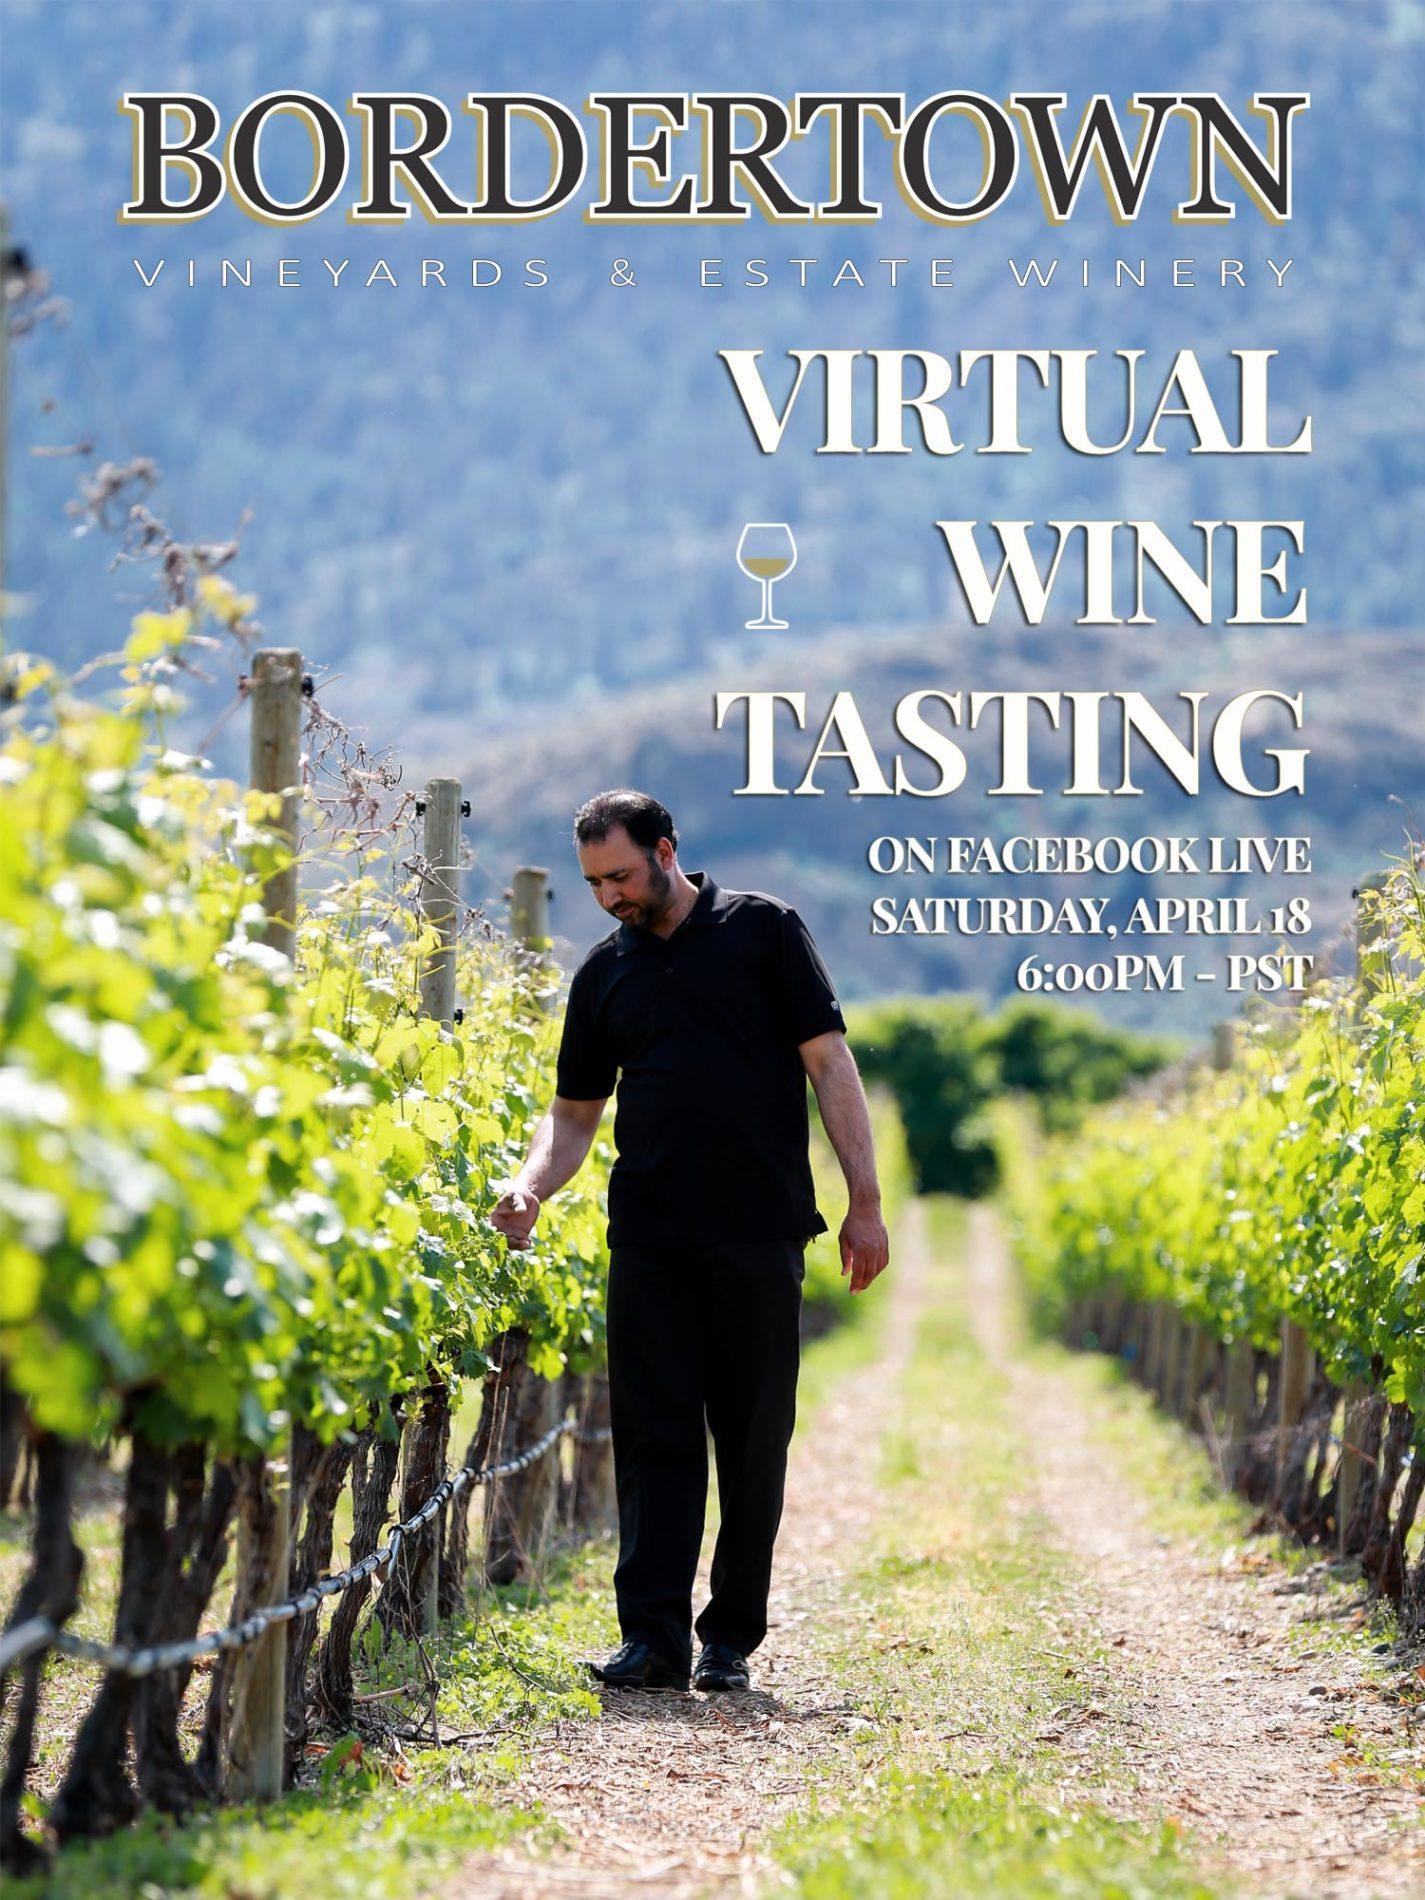 B168EE42 1138 43C0 AD64 9DC801809E6D tMcUy3.tmp  - Bordertown Virtual Wine Tasting